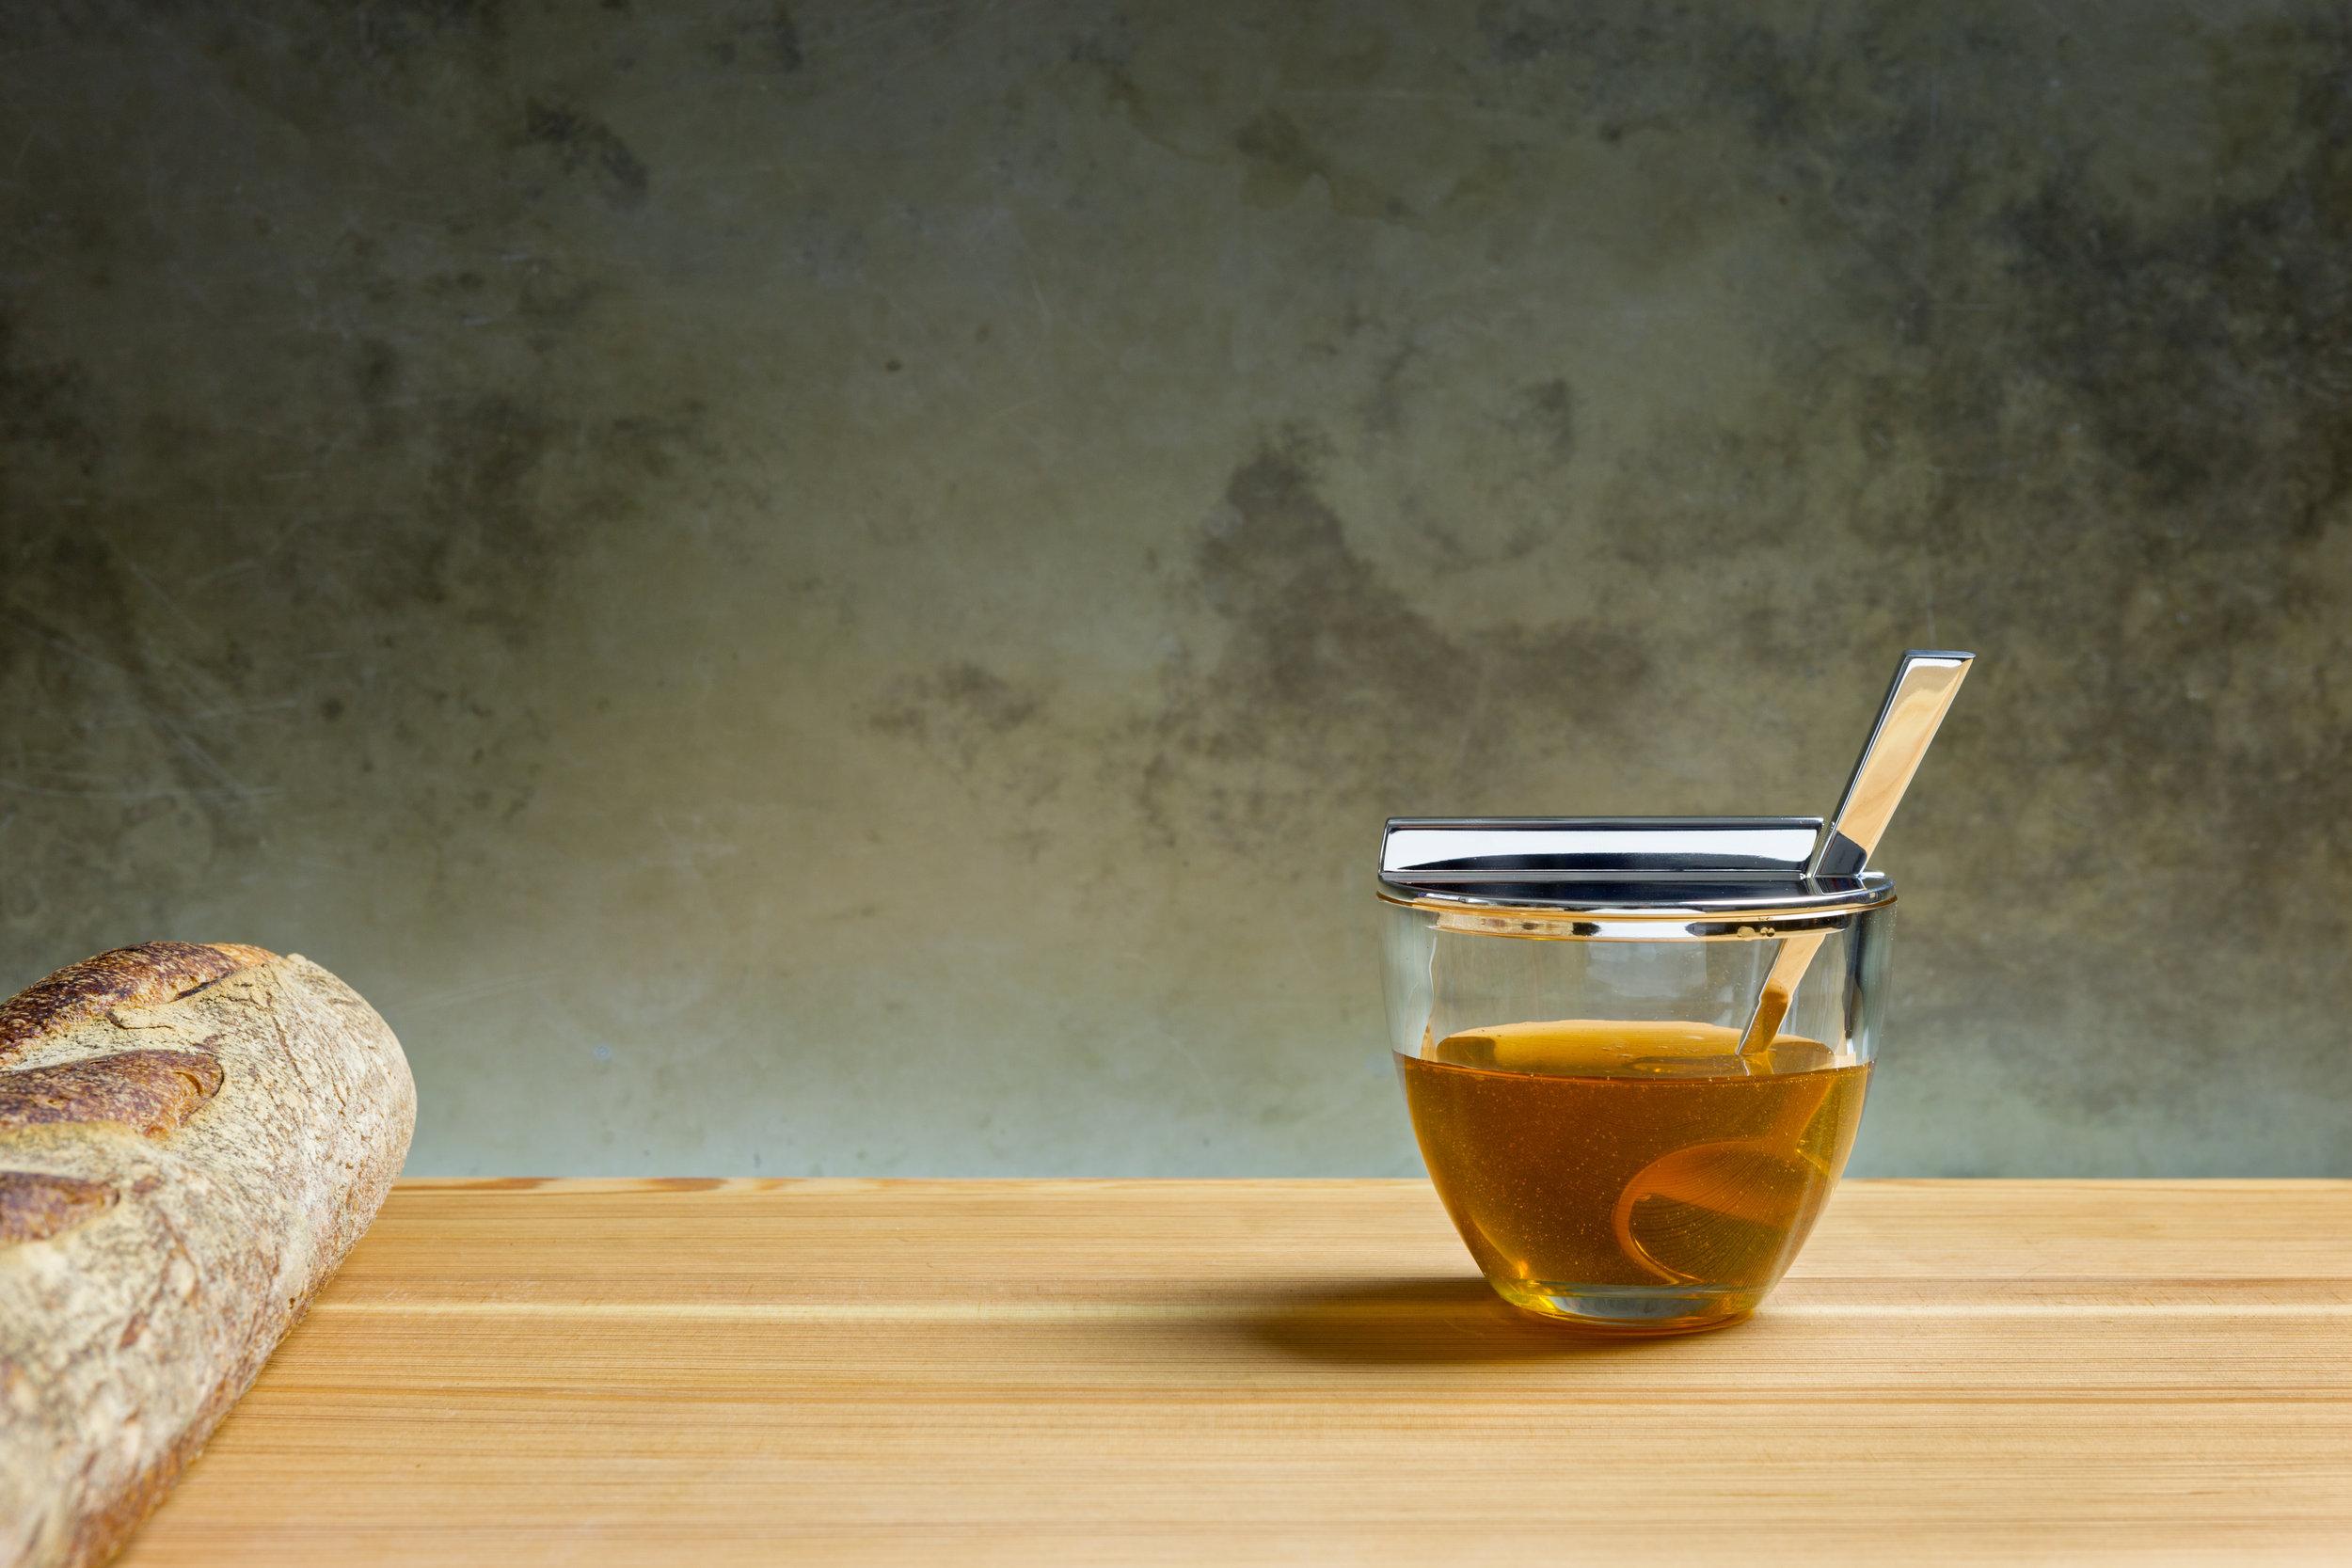 E&Co - Honey Pot © Michael Franke